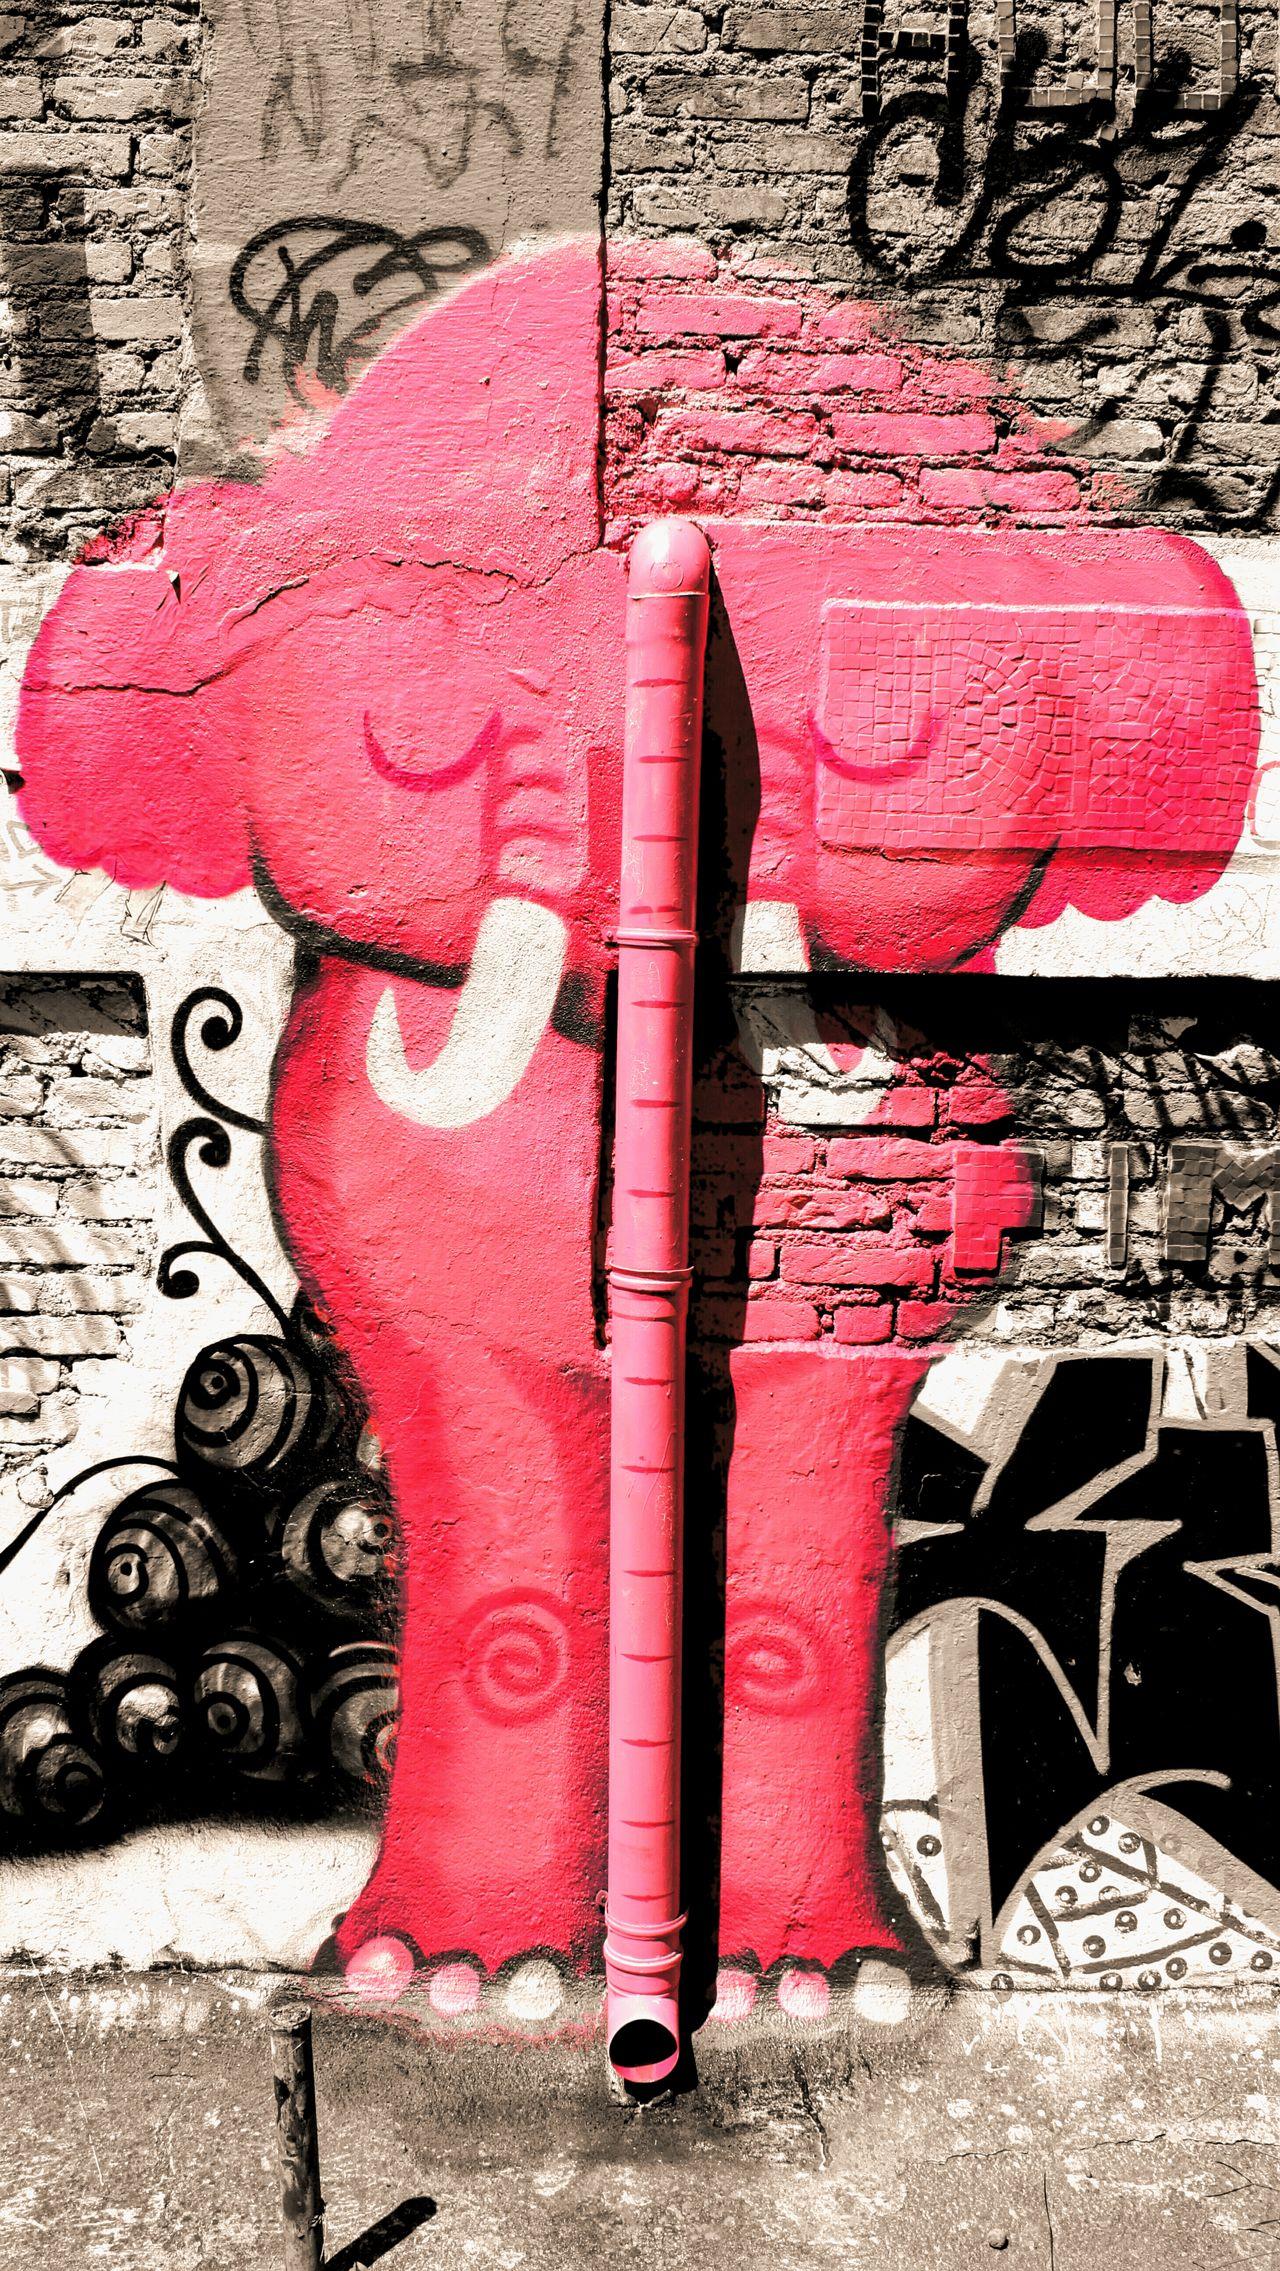 DPassos Street Art Urbanphotography Urban Geometry Popular Art Becodobatman